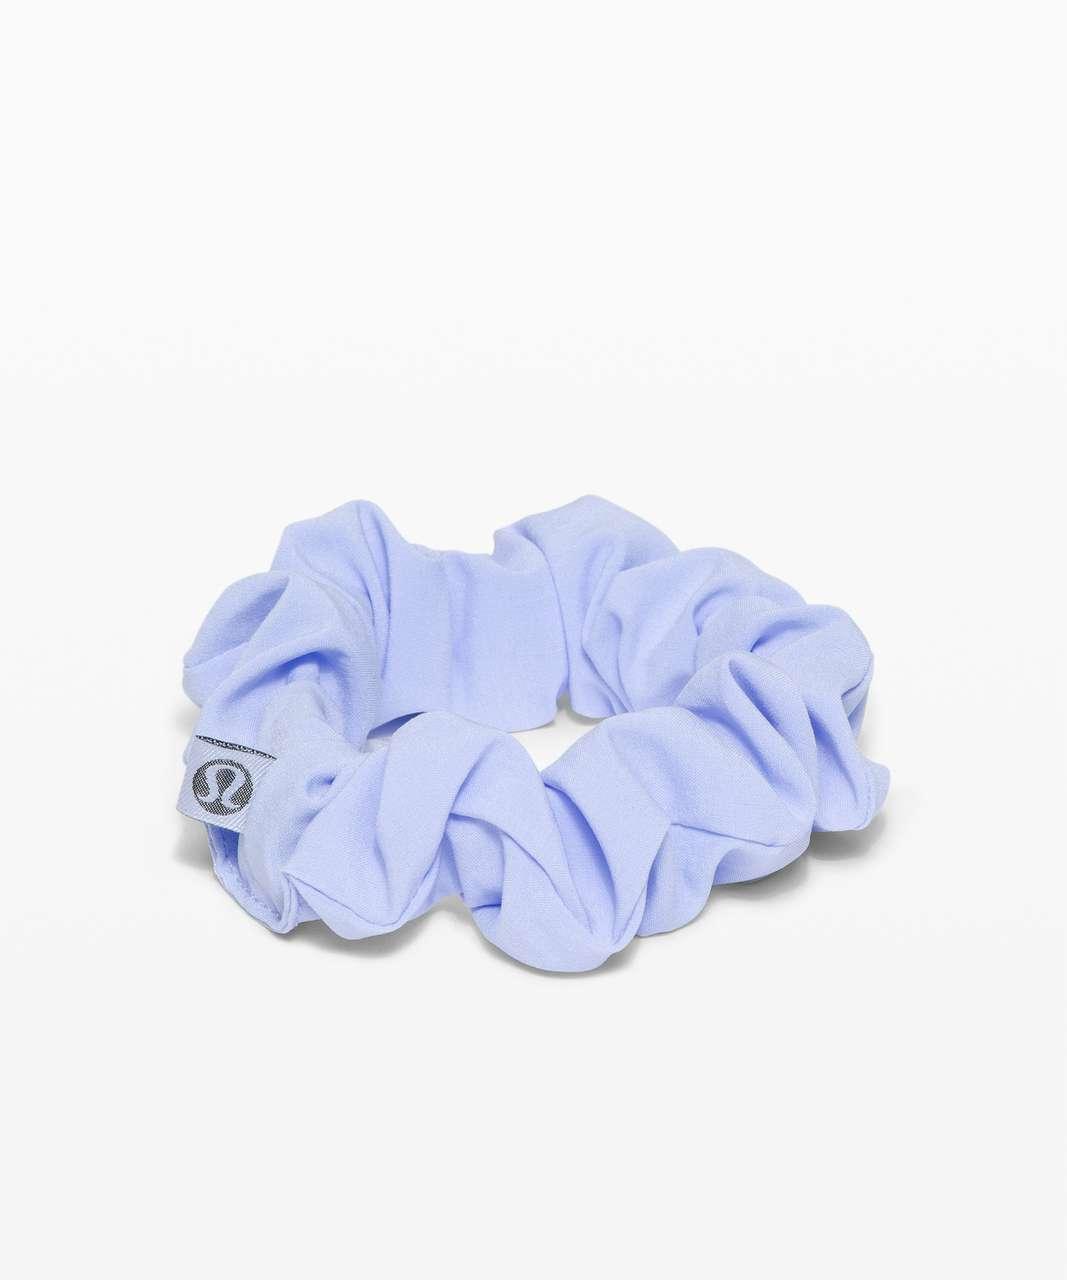 Lululemon Uplifting Scrunchie - Lavender Dusk